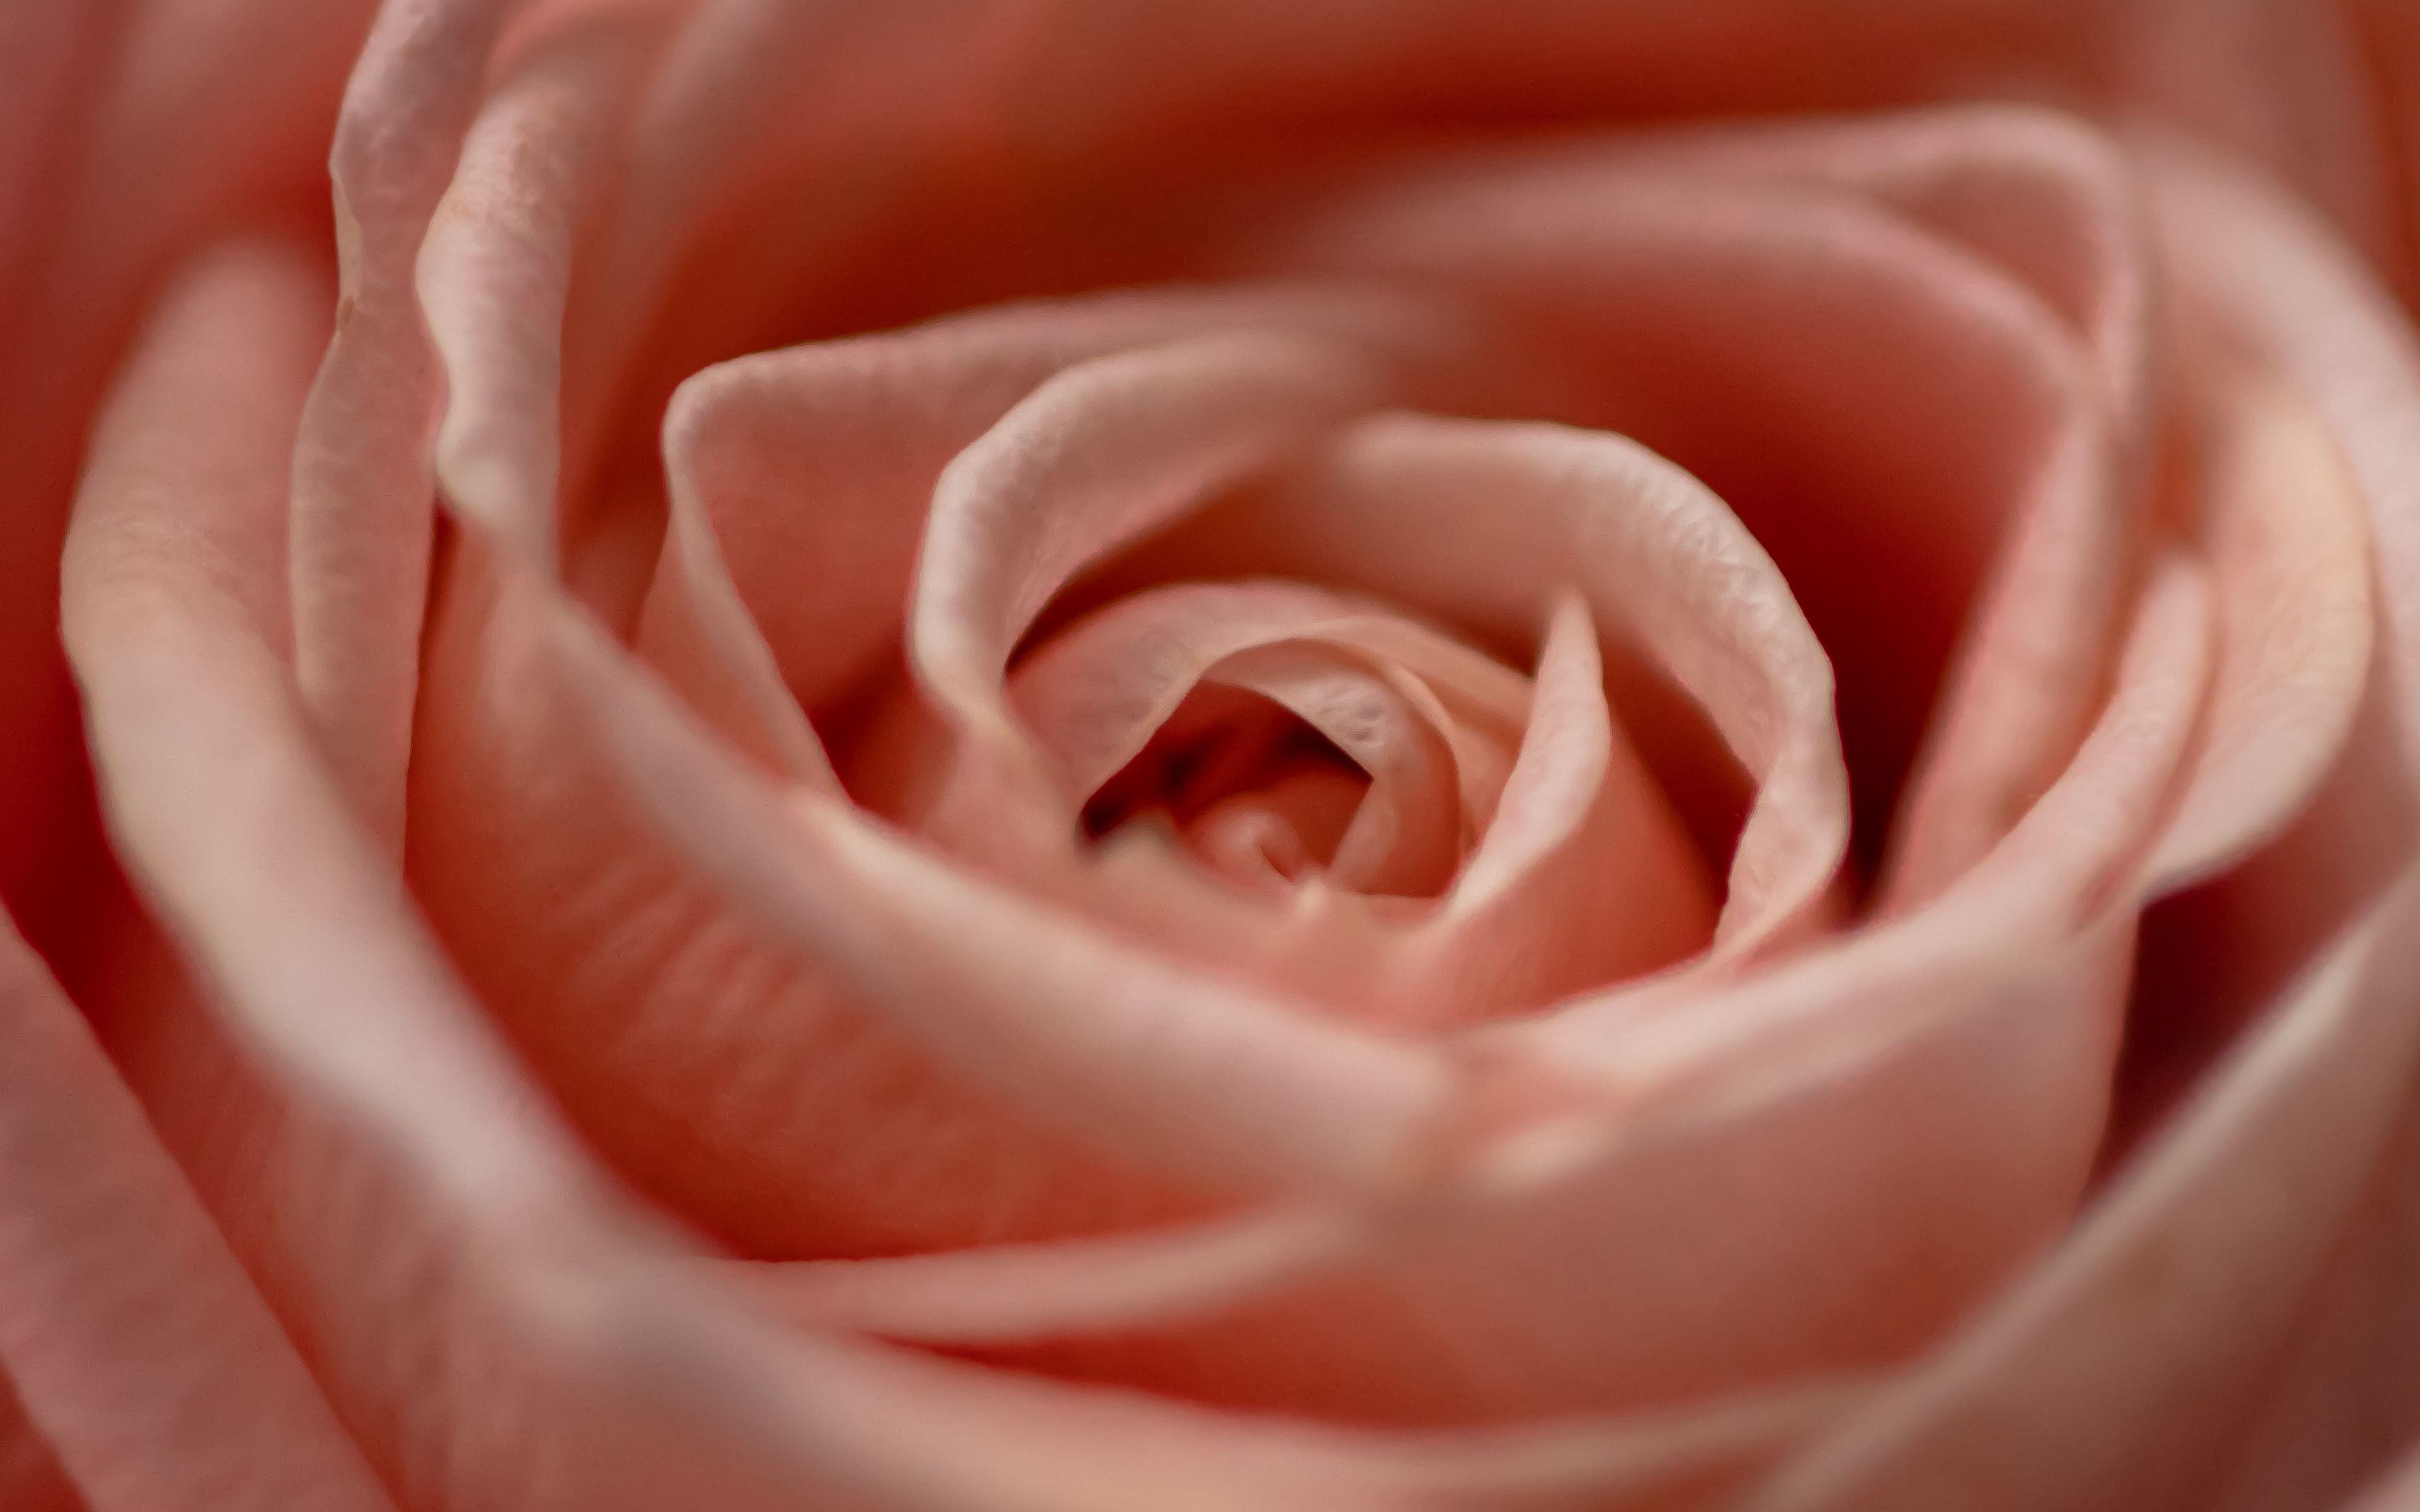 Fondos de pantalla Petalos de rosa de cerca